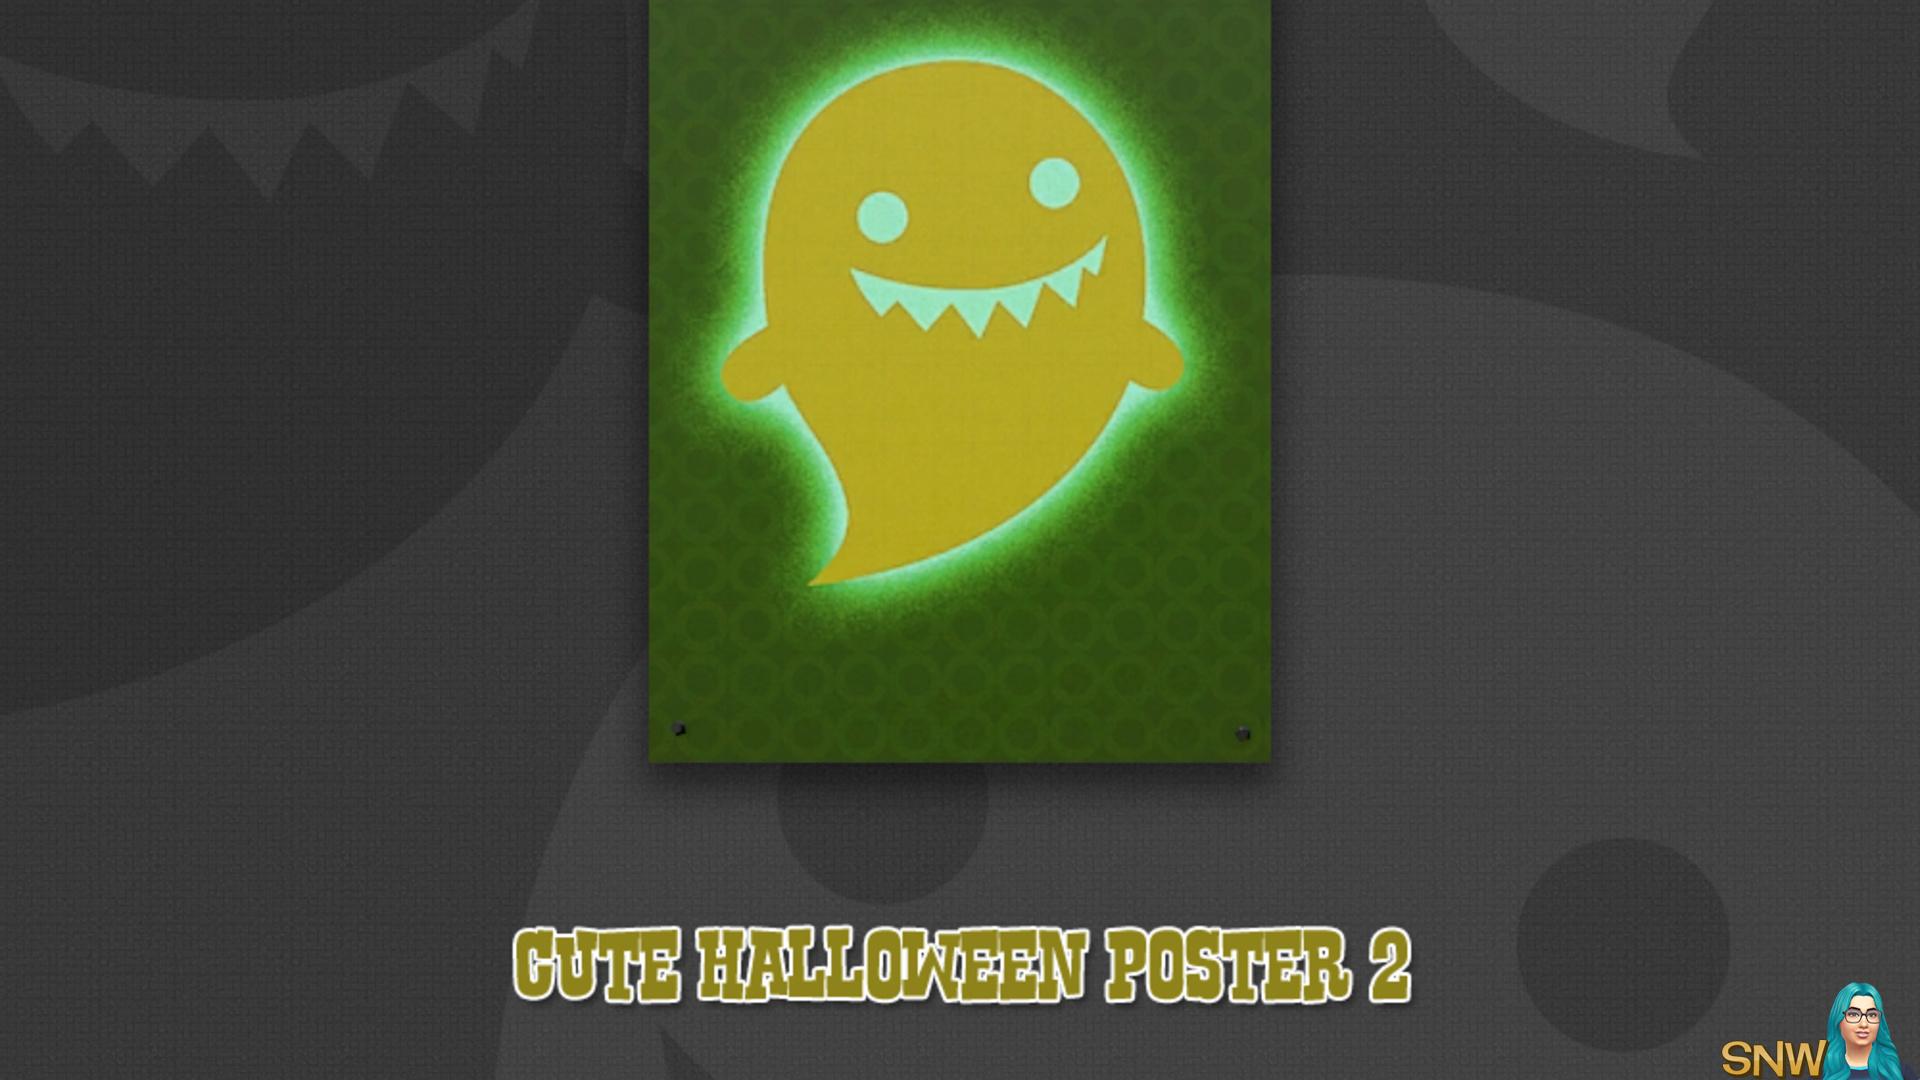 Cute Halloween poster #2 (Spooky)